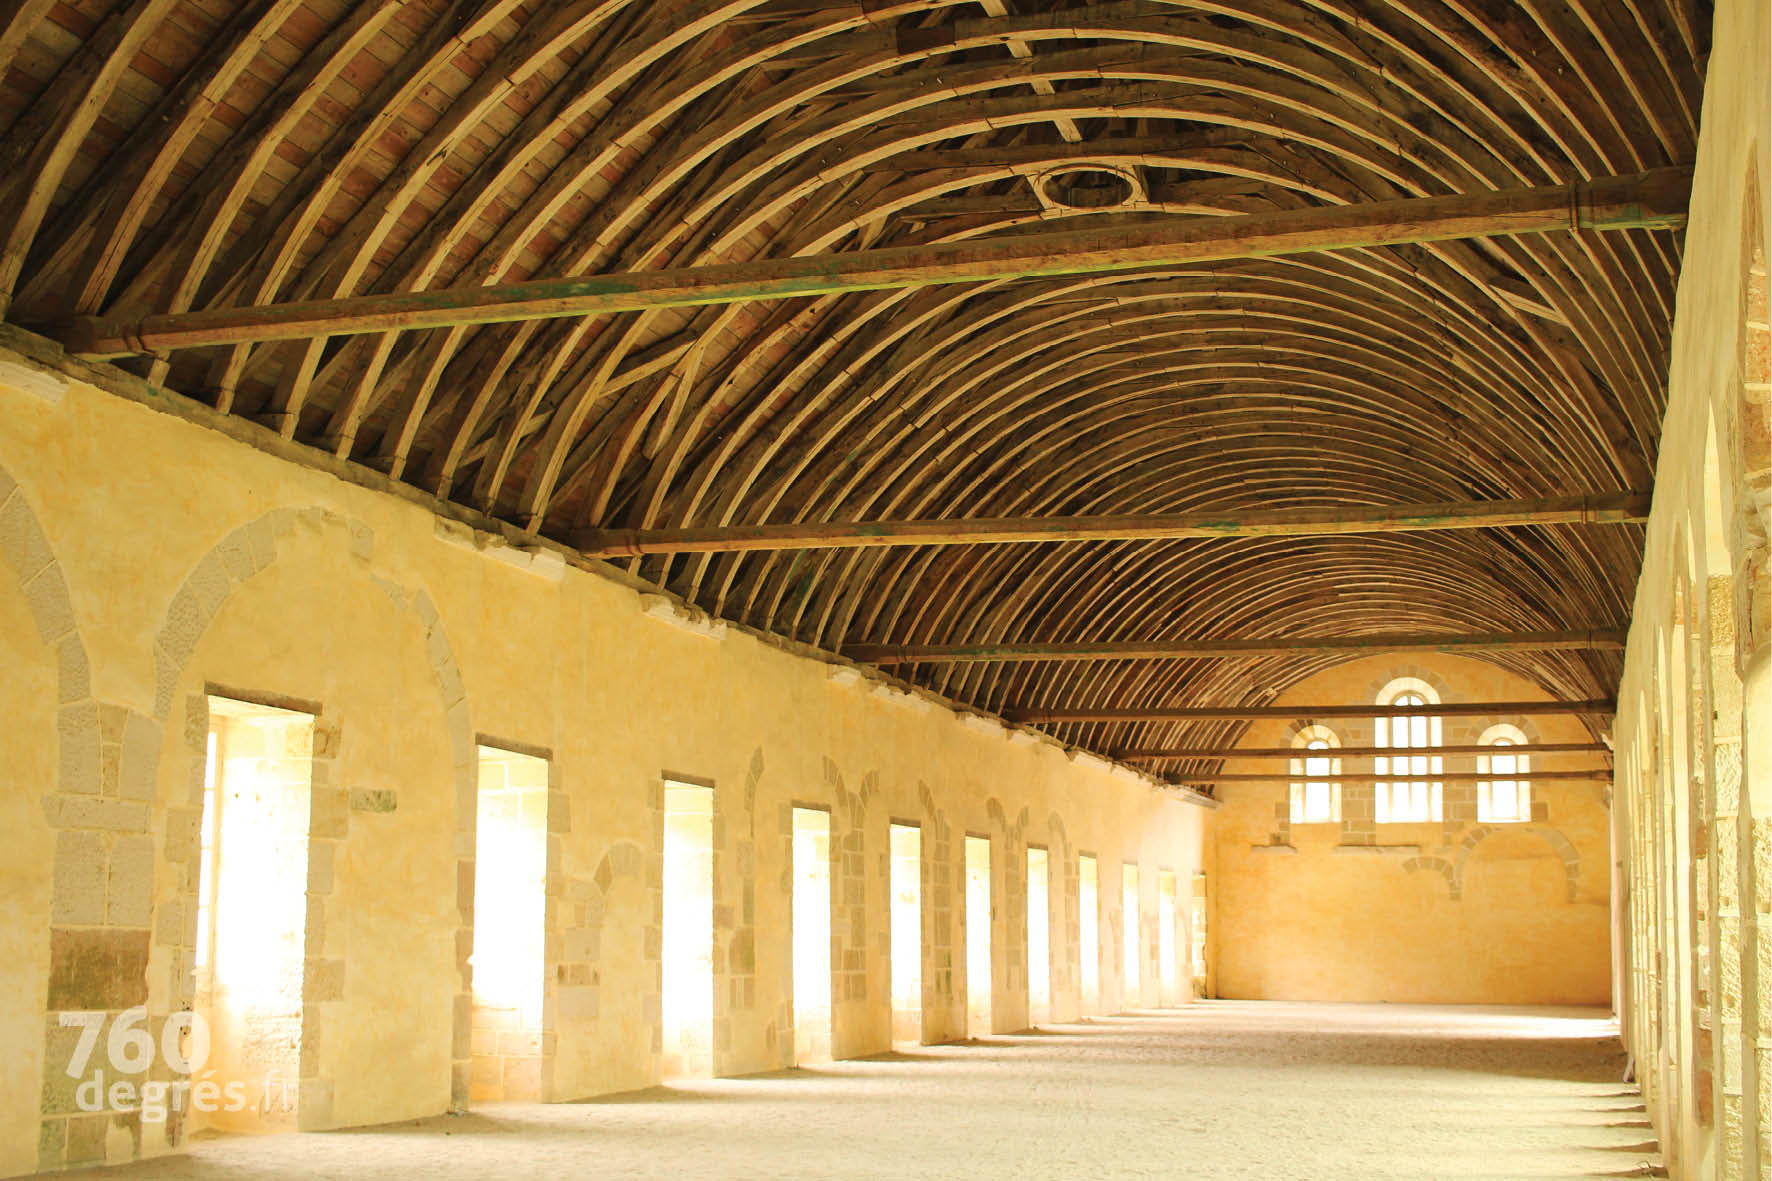 760degres-abbaye-fontenay-06